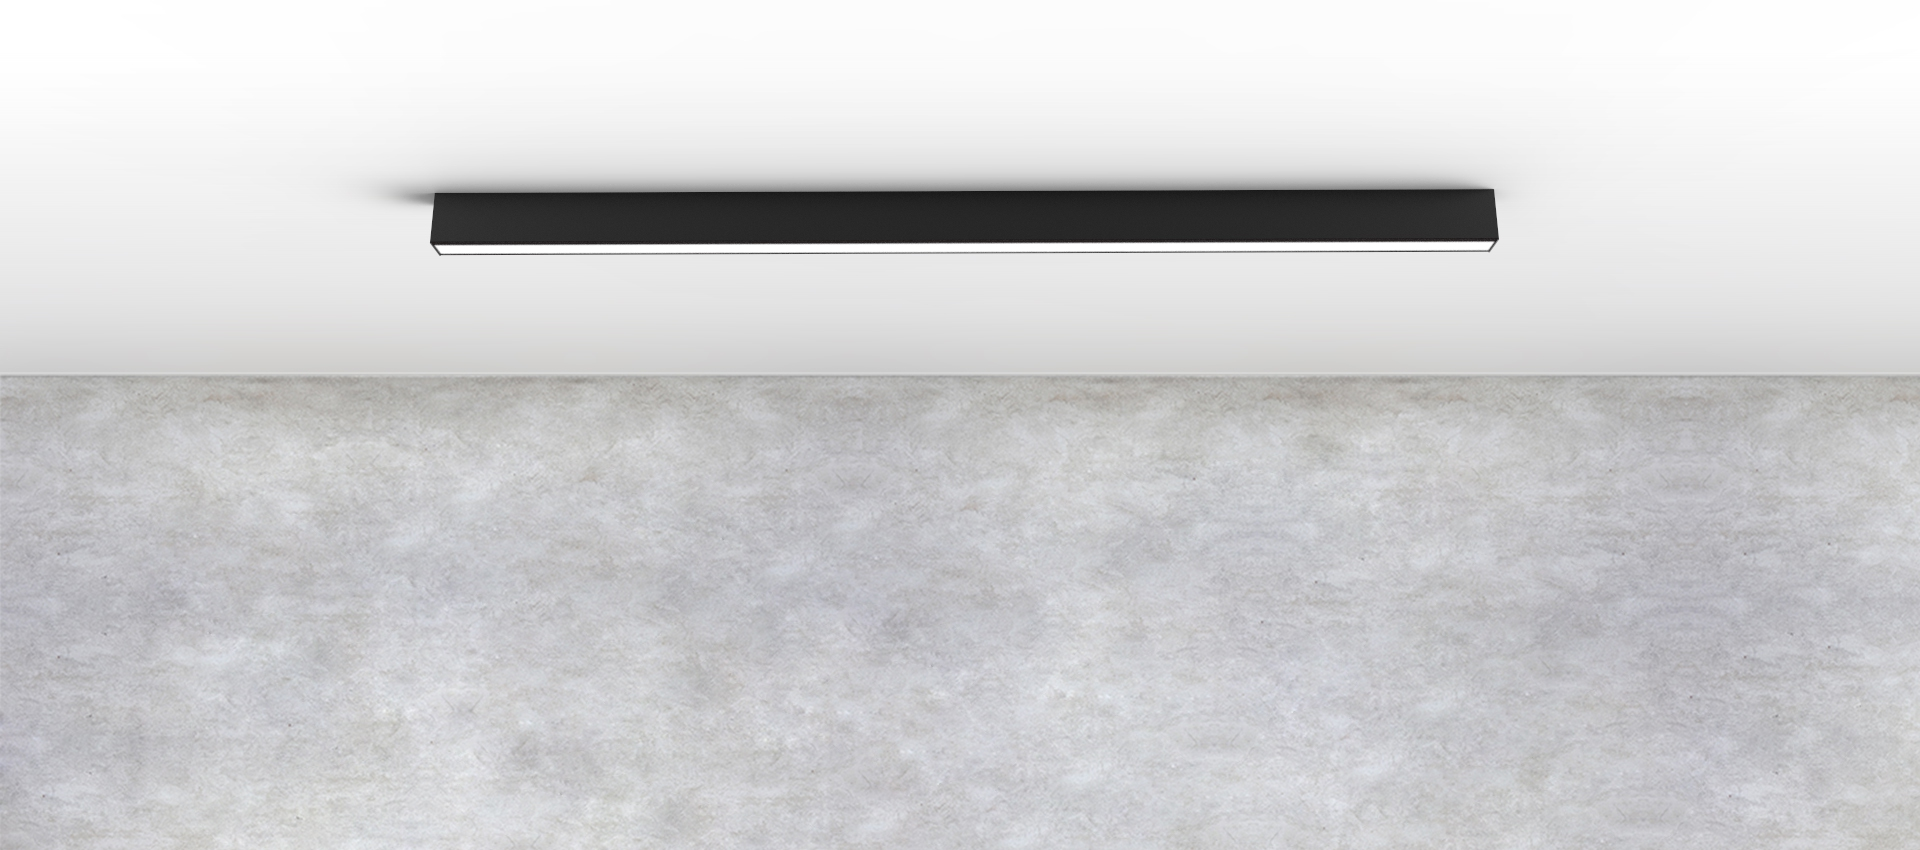 1007-09-260-Leck Surface - Keyshot -on.529.jpg